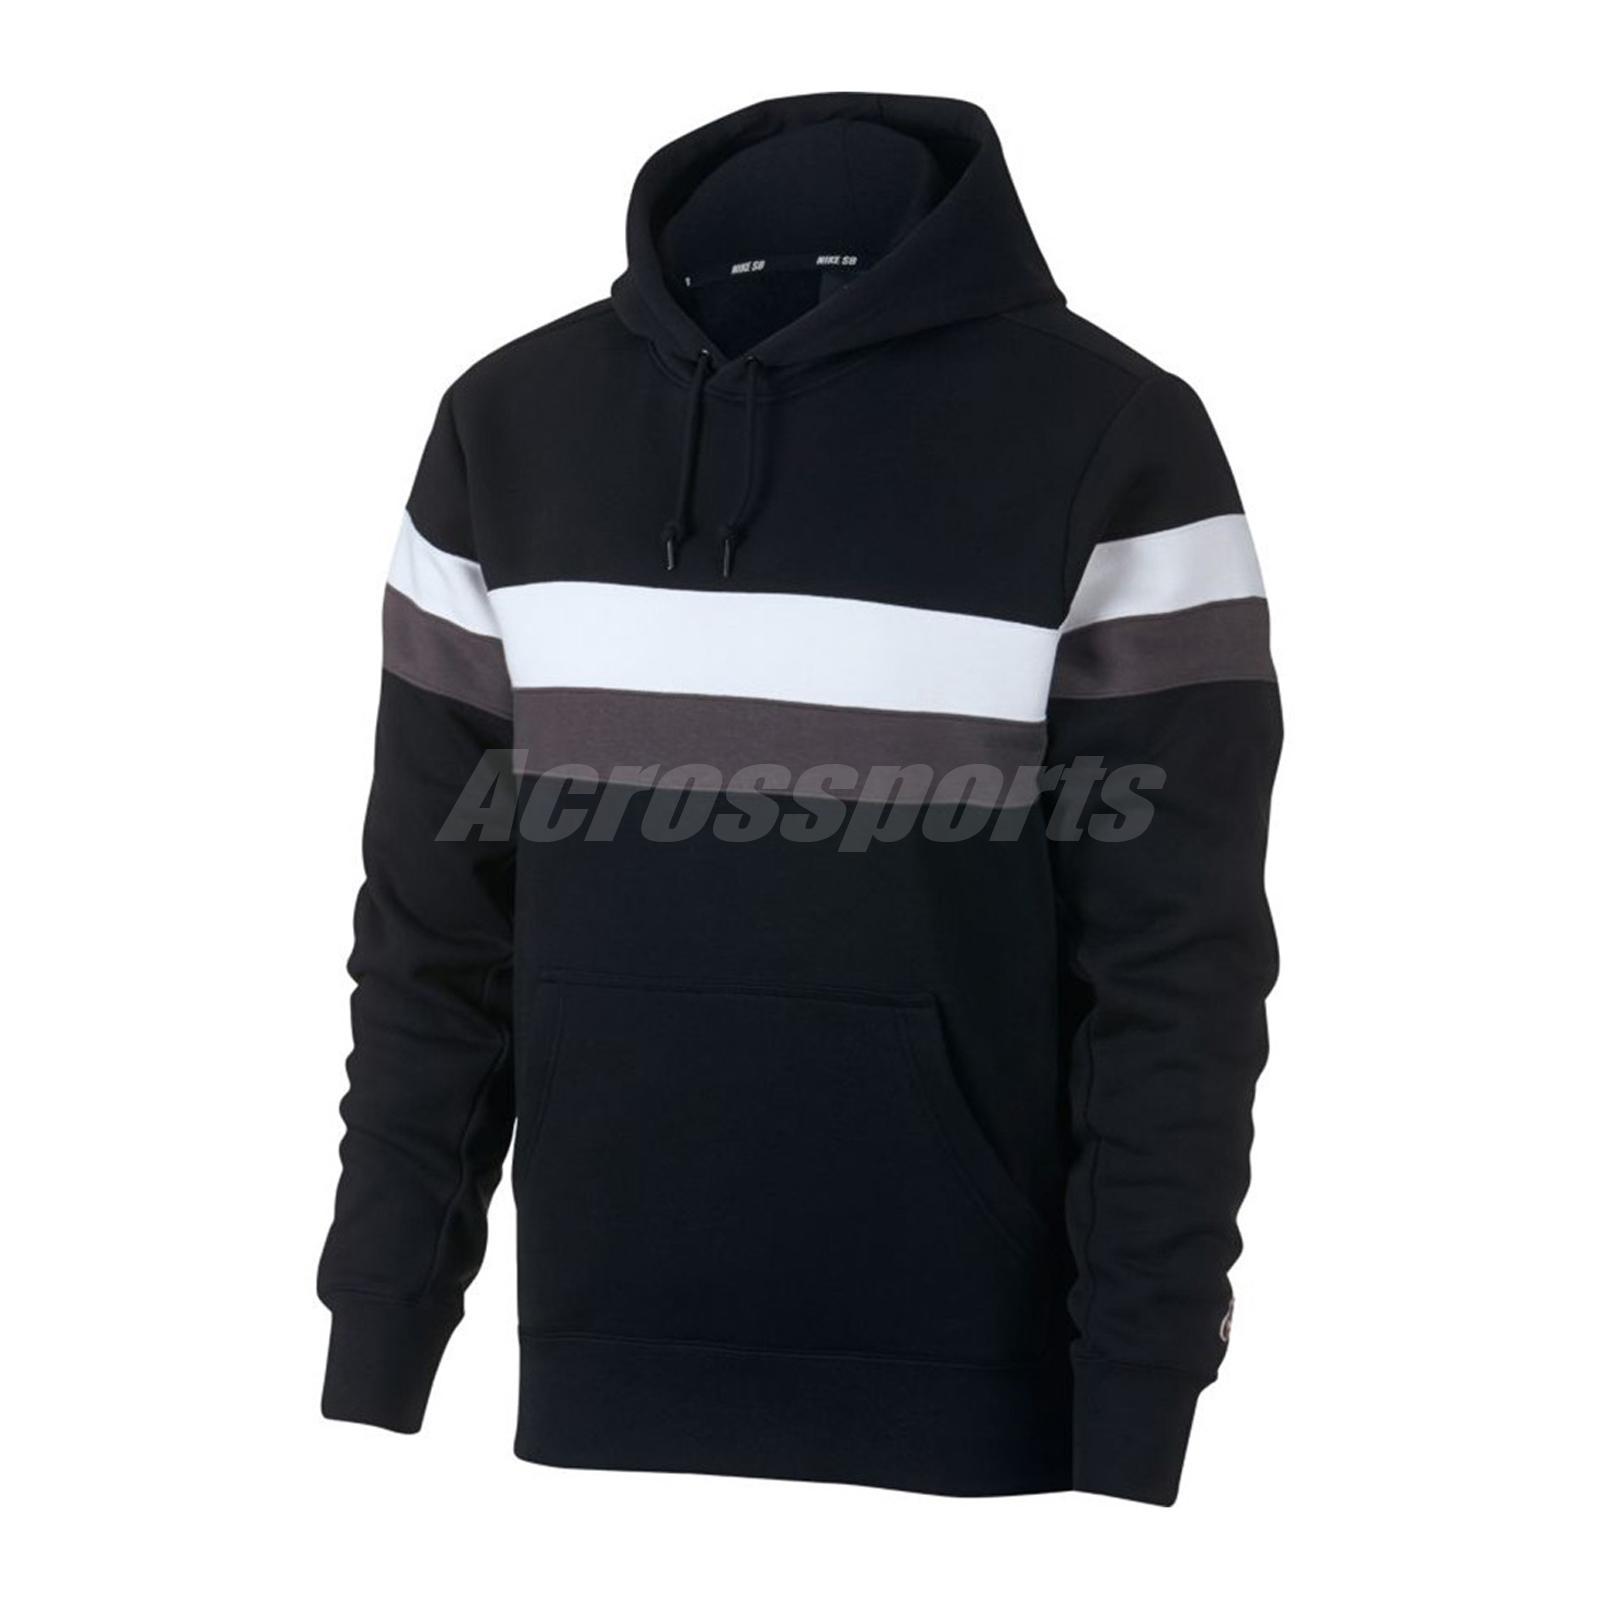 effa966f15 Nike SB Hoodie Icon Stripes Fleece Skateboarding Sport Fitness Black ... nike  sb hoodie